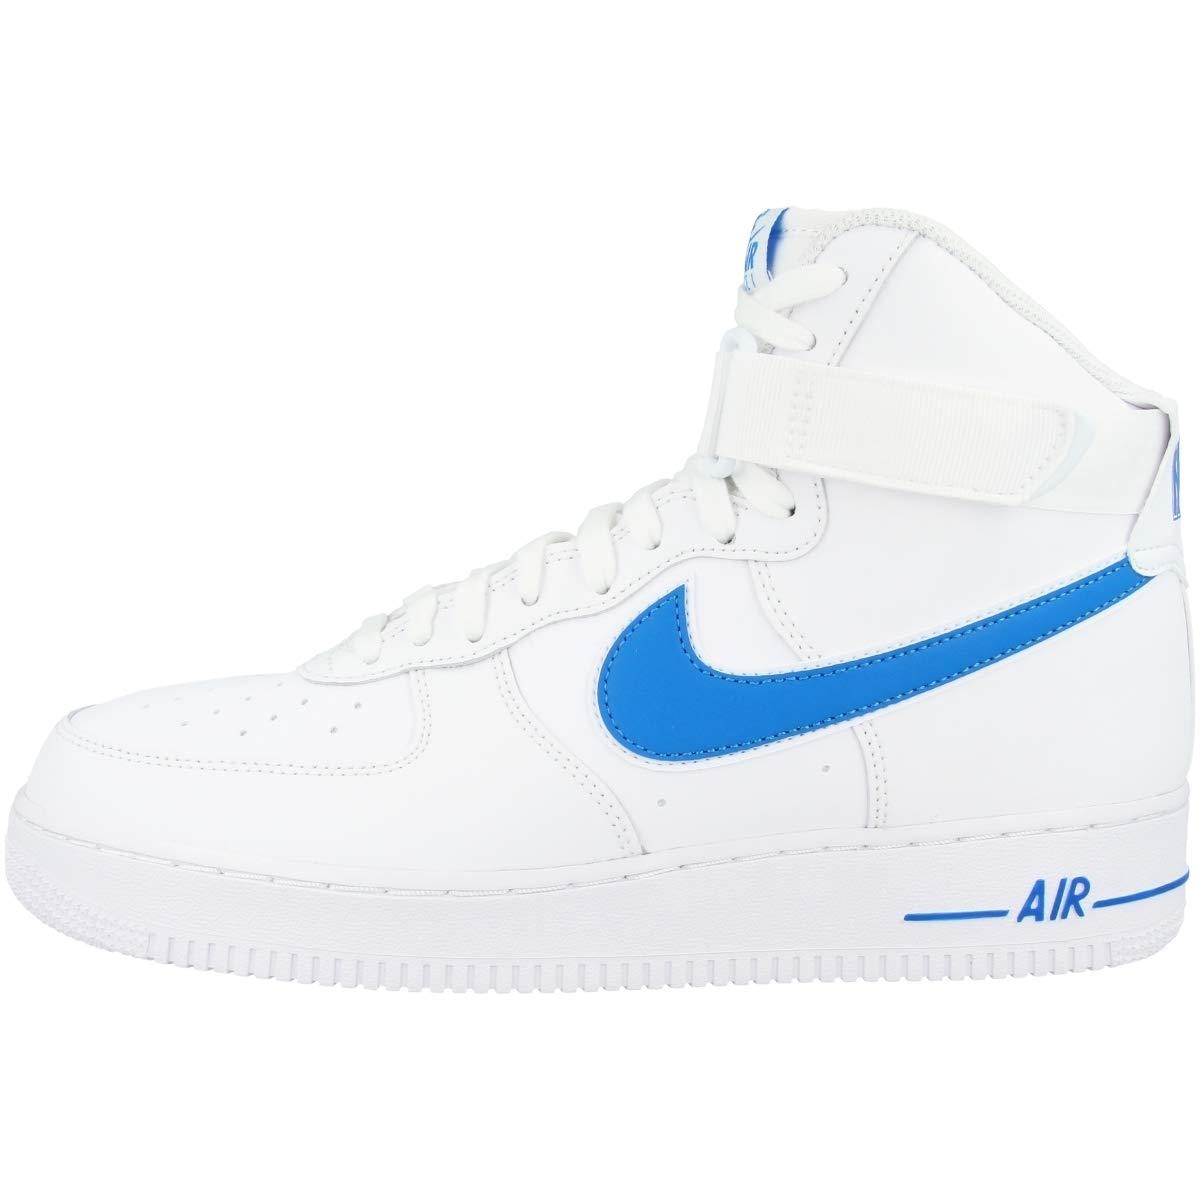 air force 1 uomo nere e blu